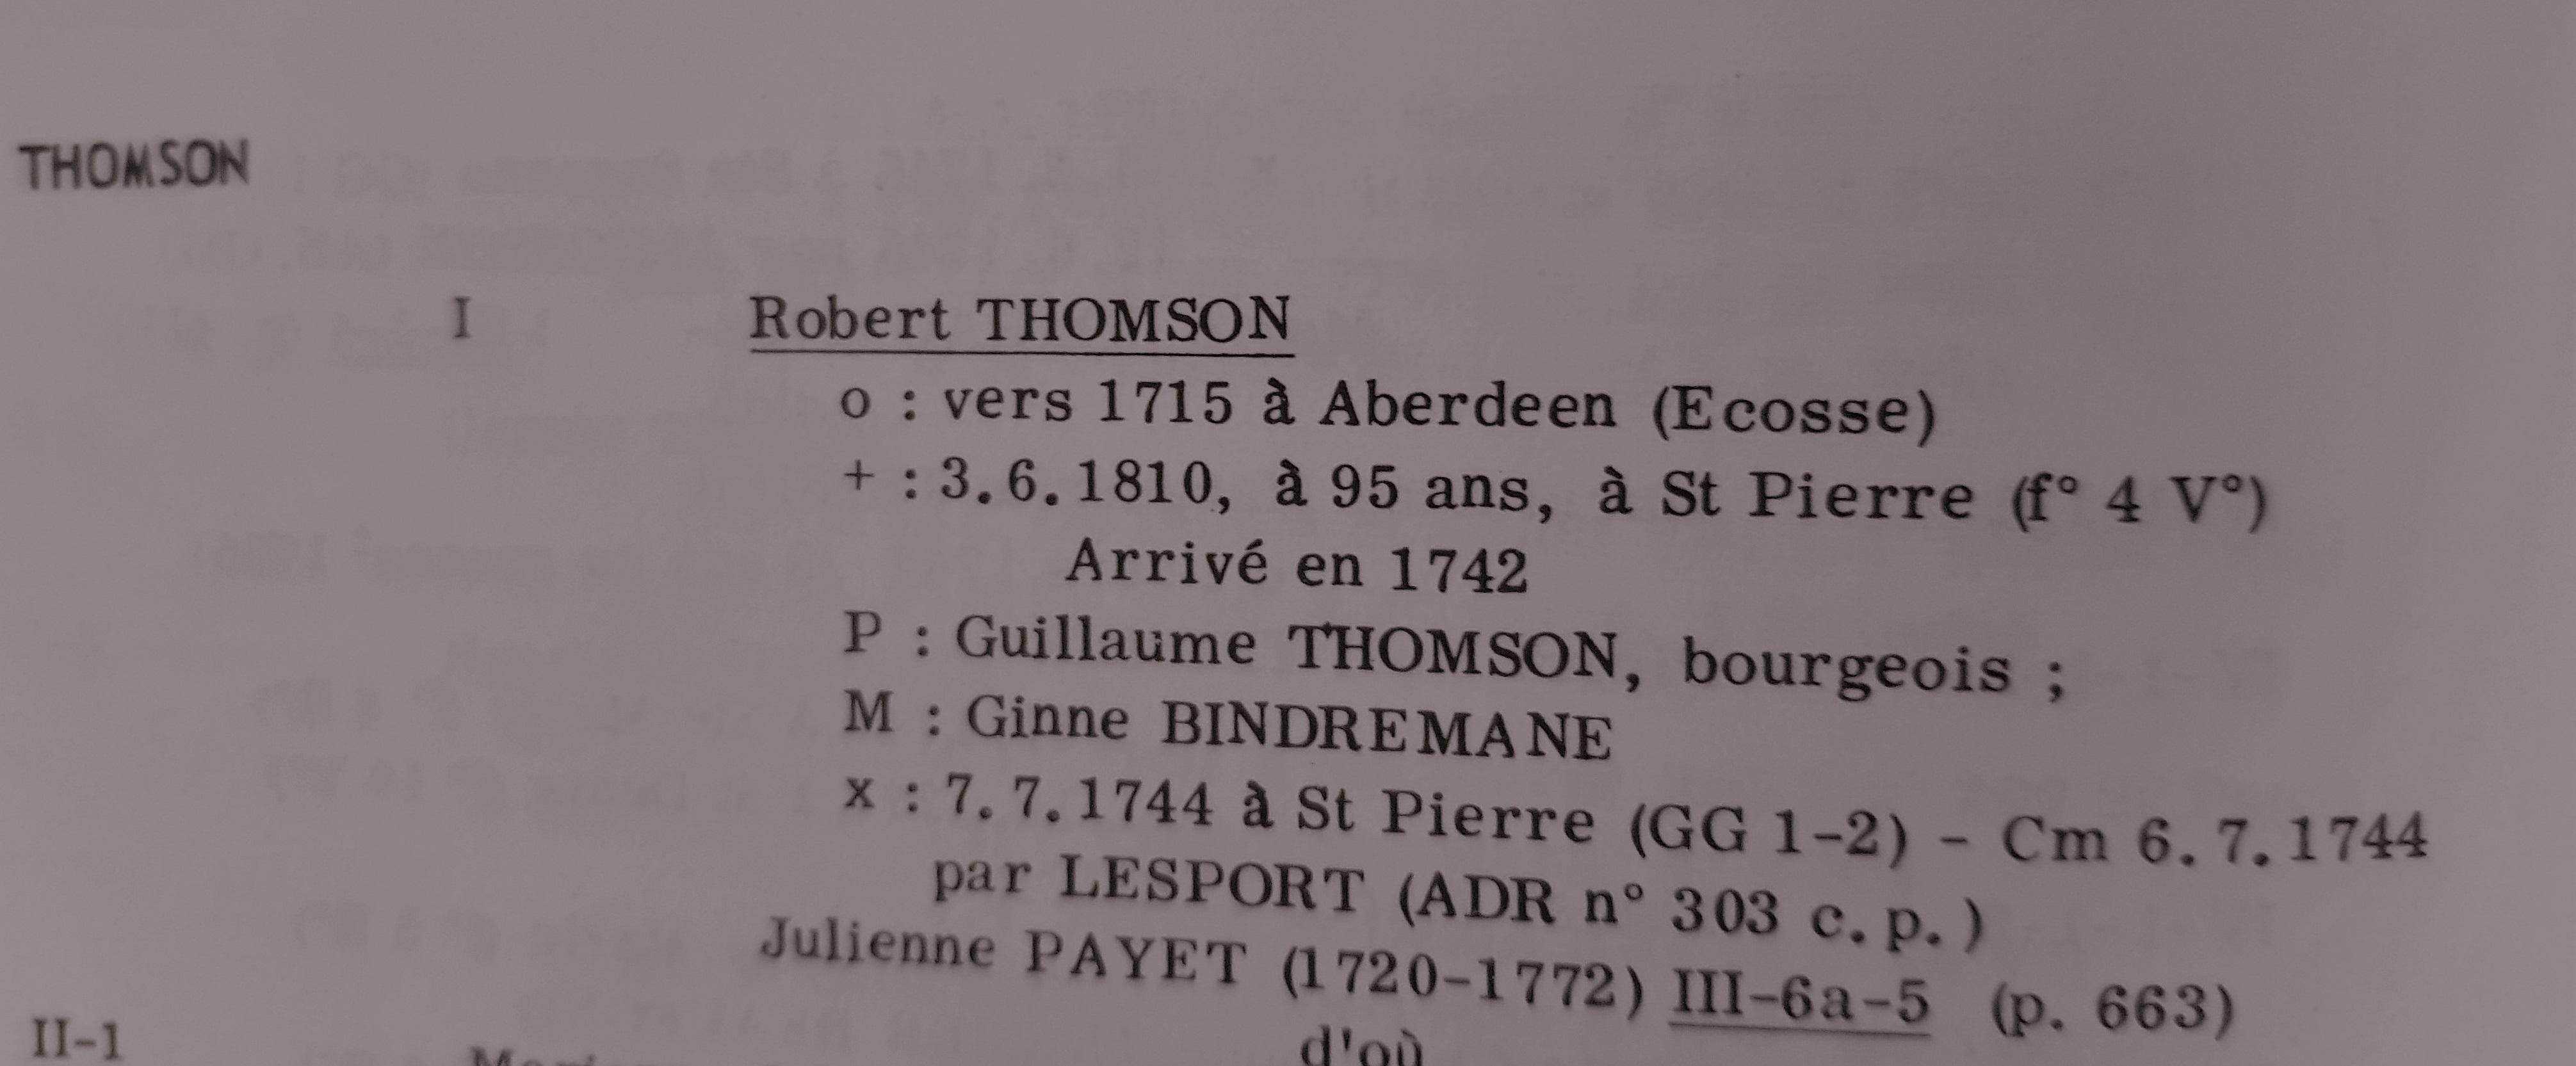 THOMSON_Robert_Dictionnaire_Ricquebourg.jpg